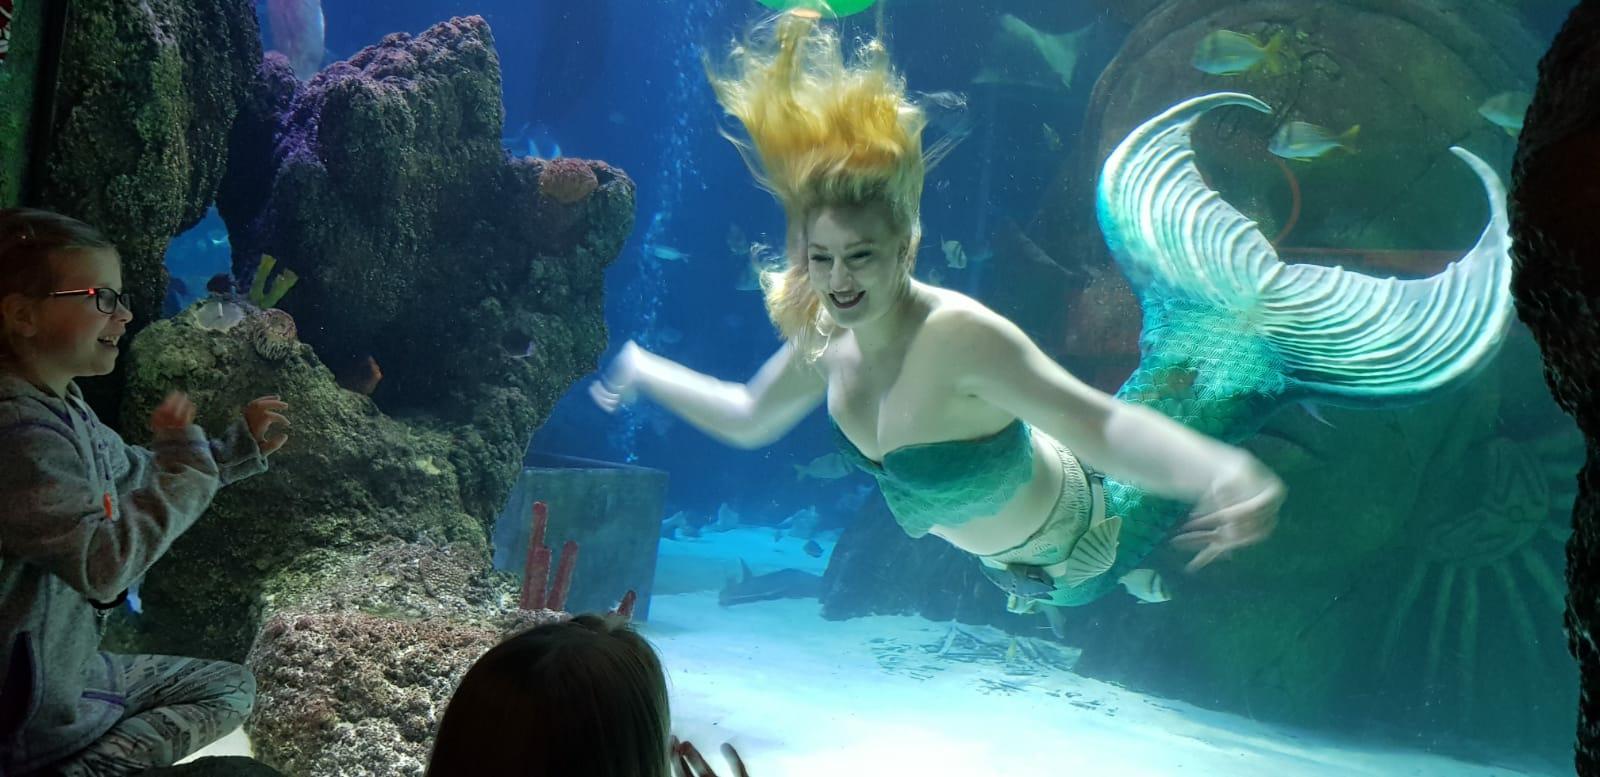 mermaid hire events